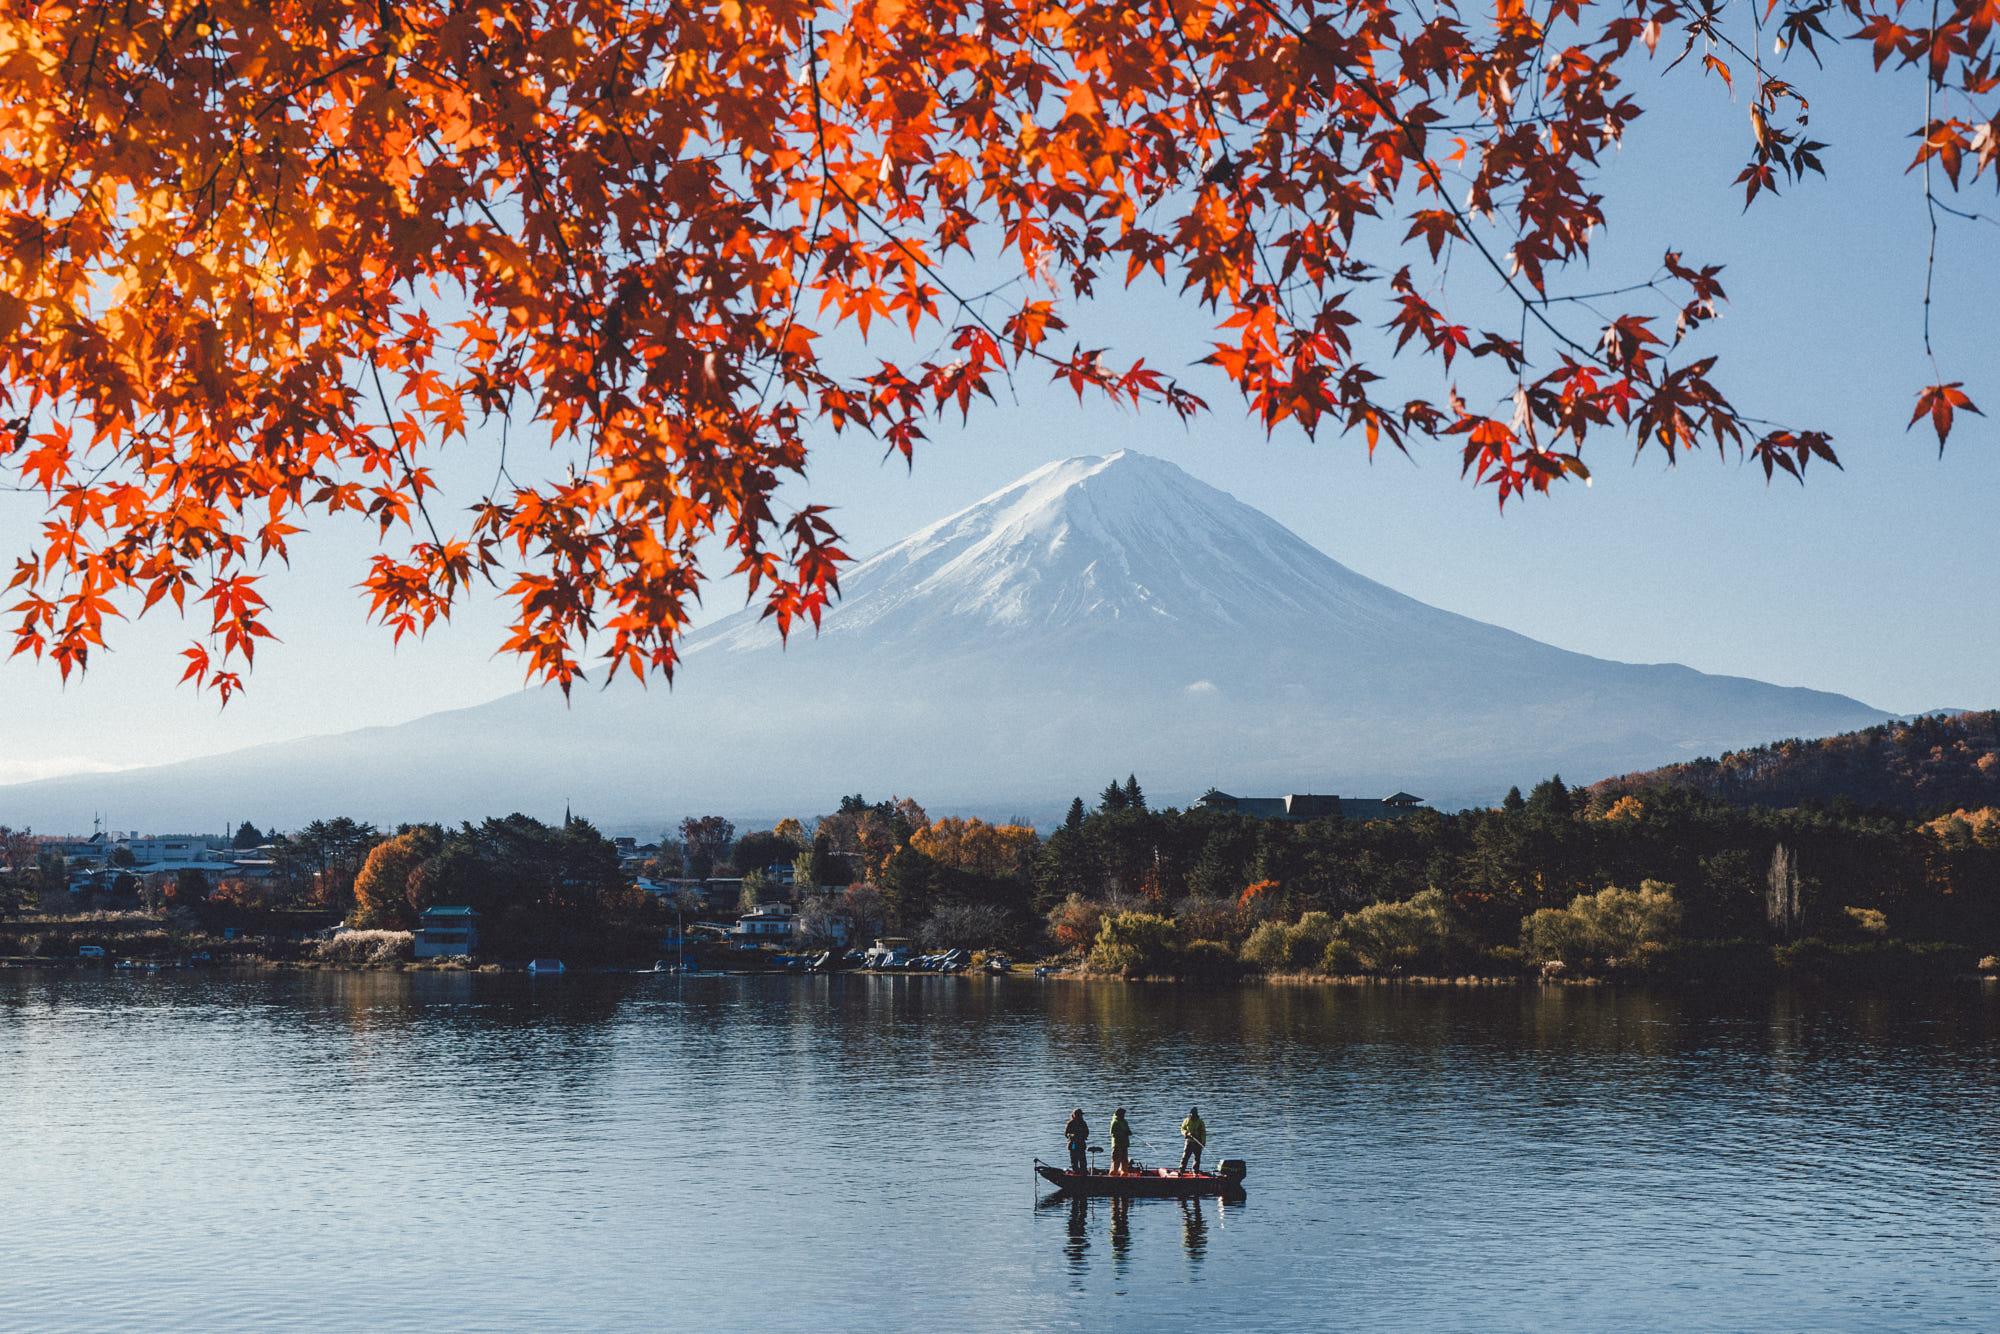 General 2000x1334 fall landscape Japan Lake Kawaguchiko Mount Fuji